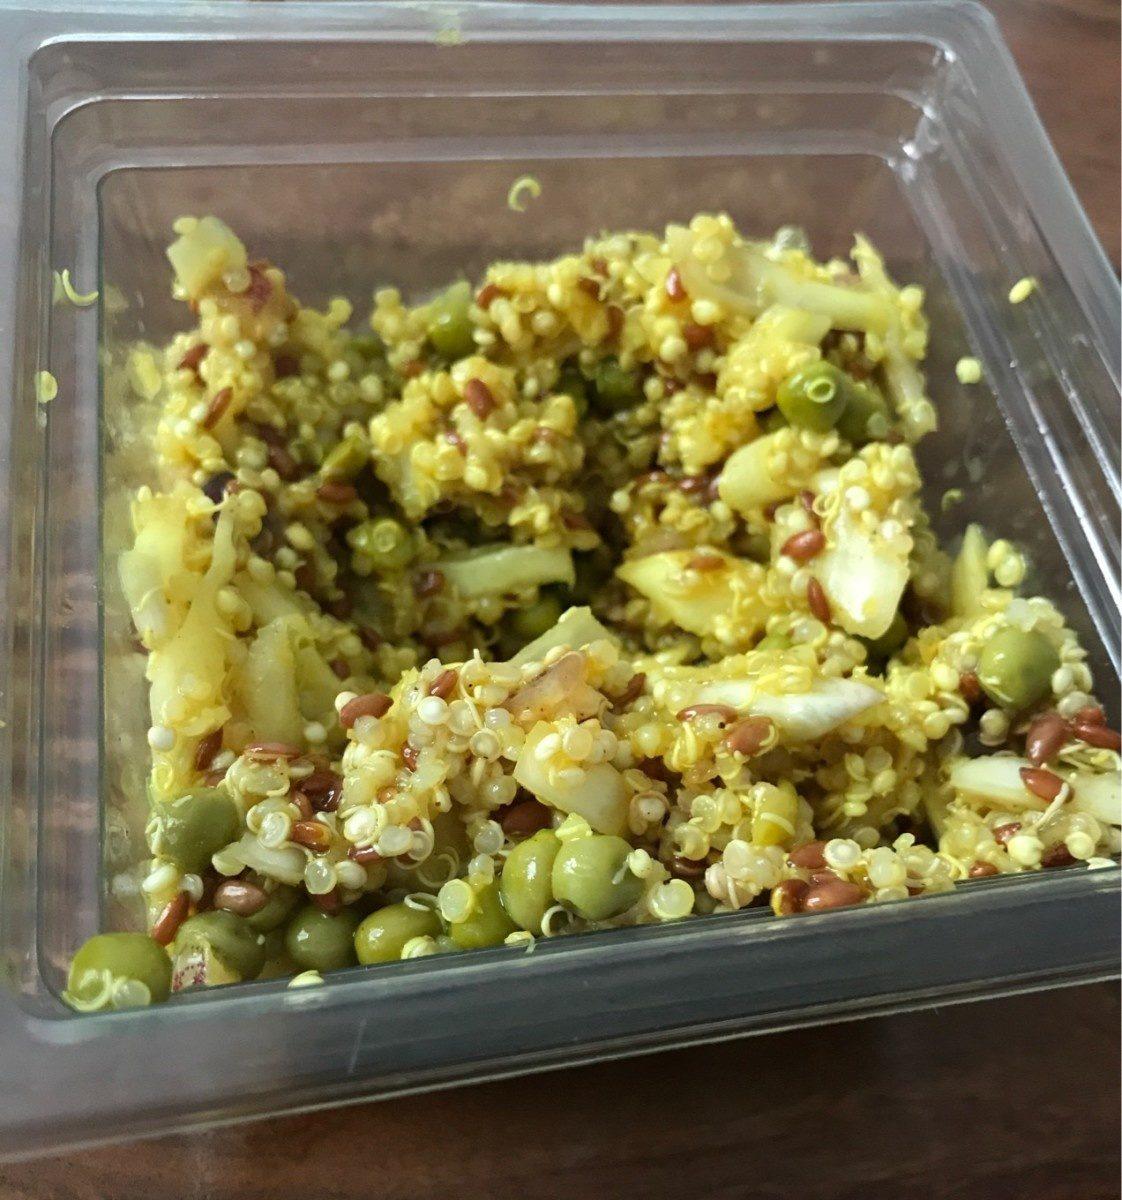 Salade de quinoa, chou et graines de lin - Producte